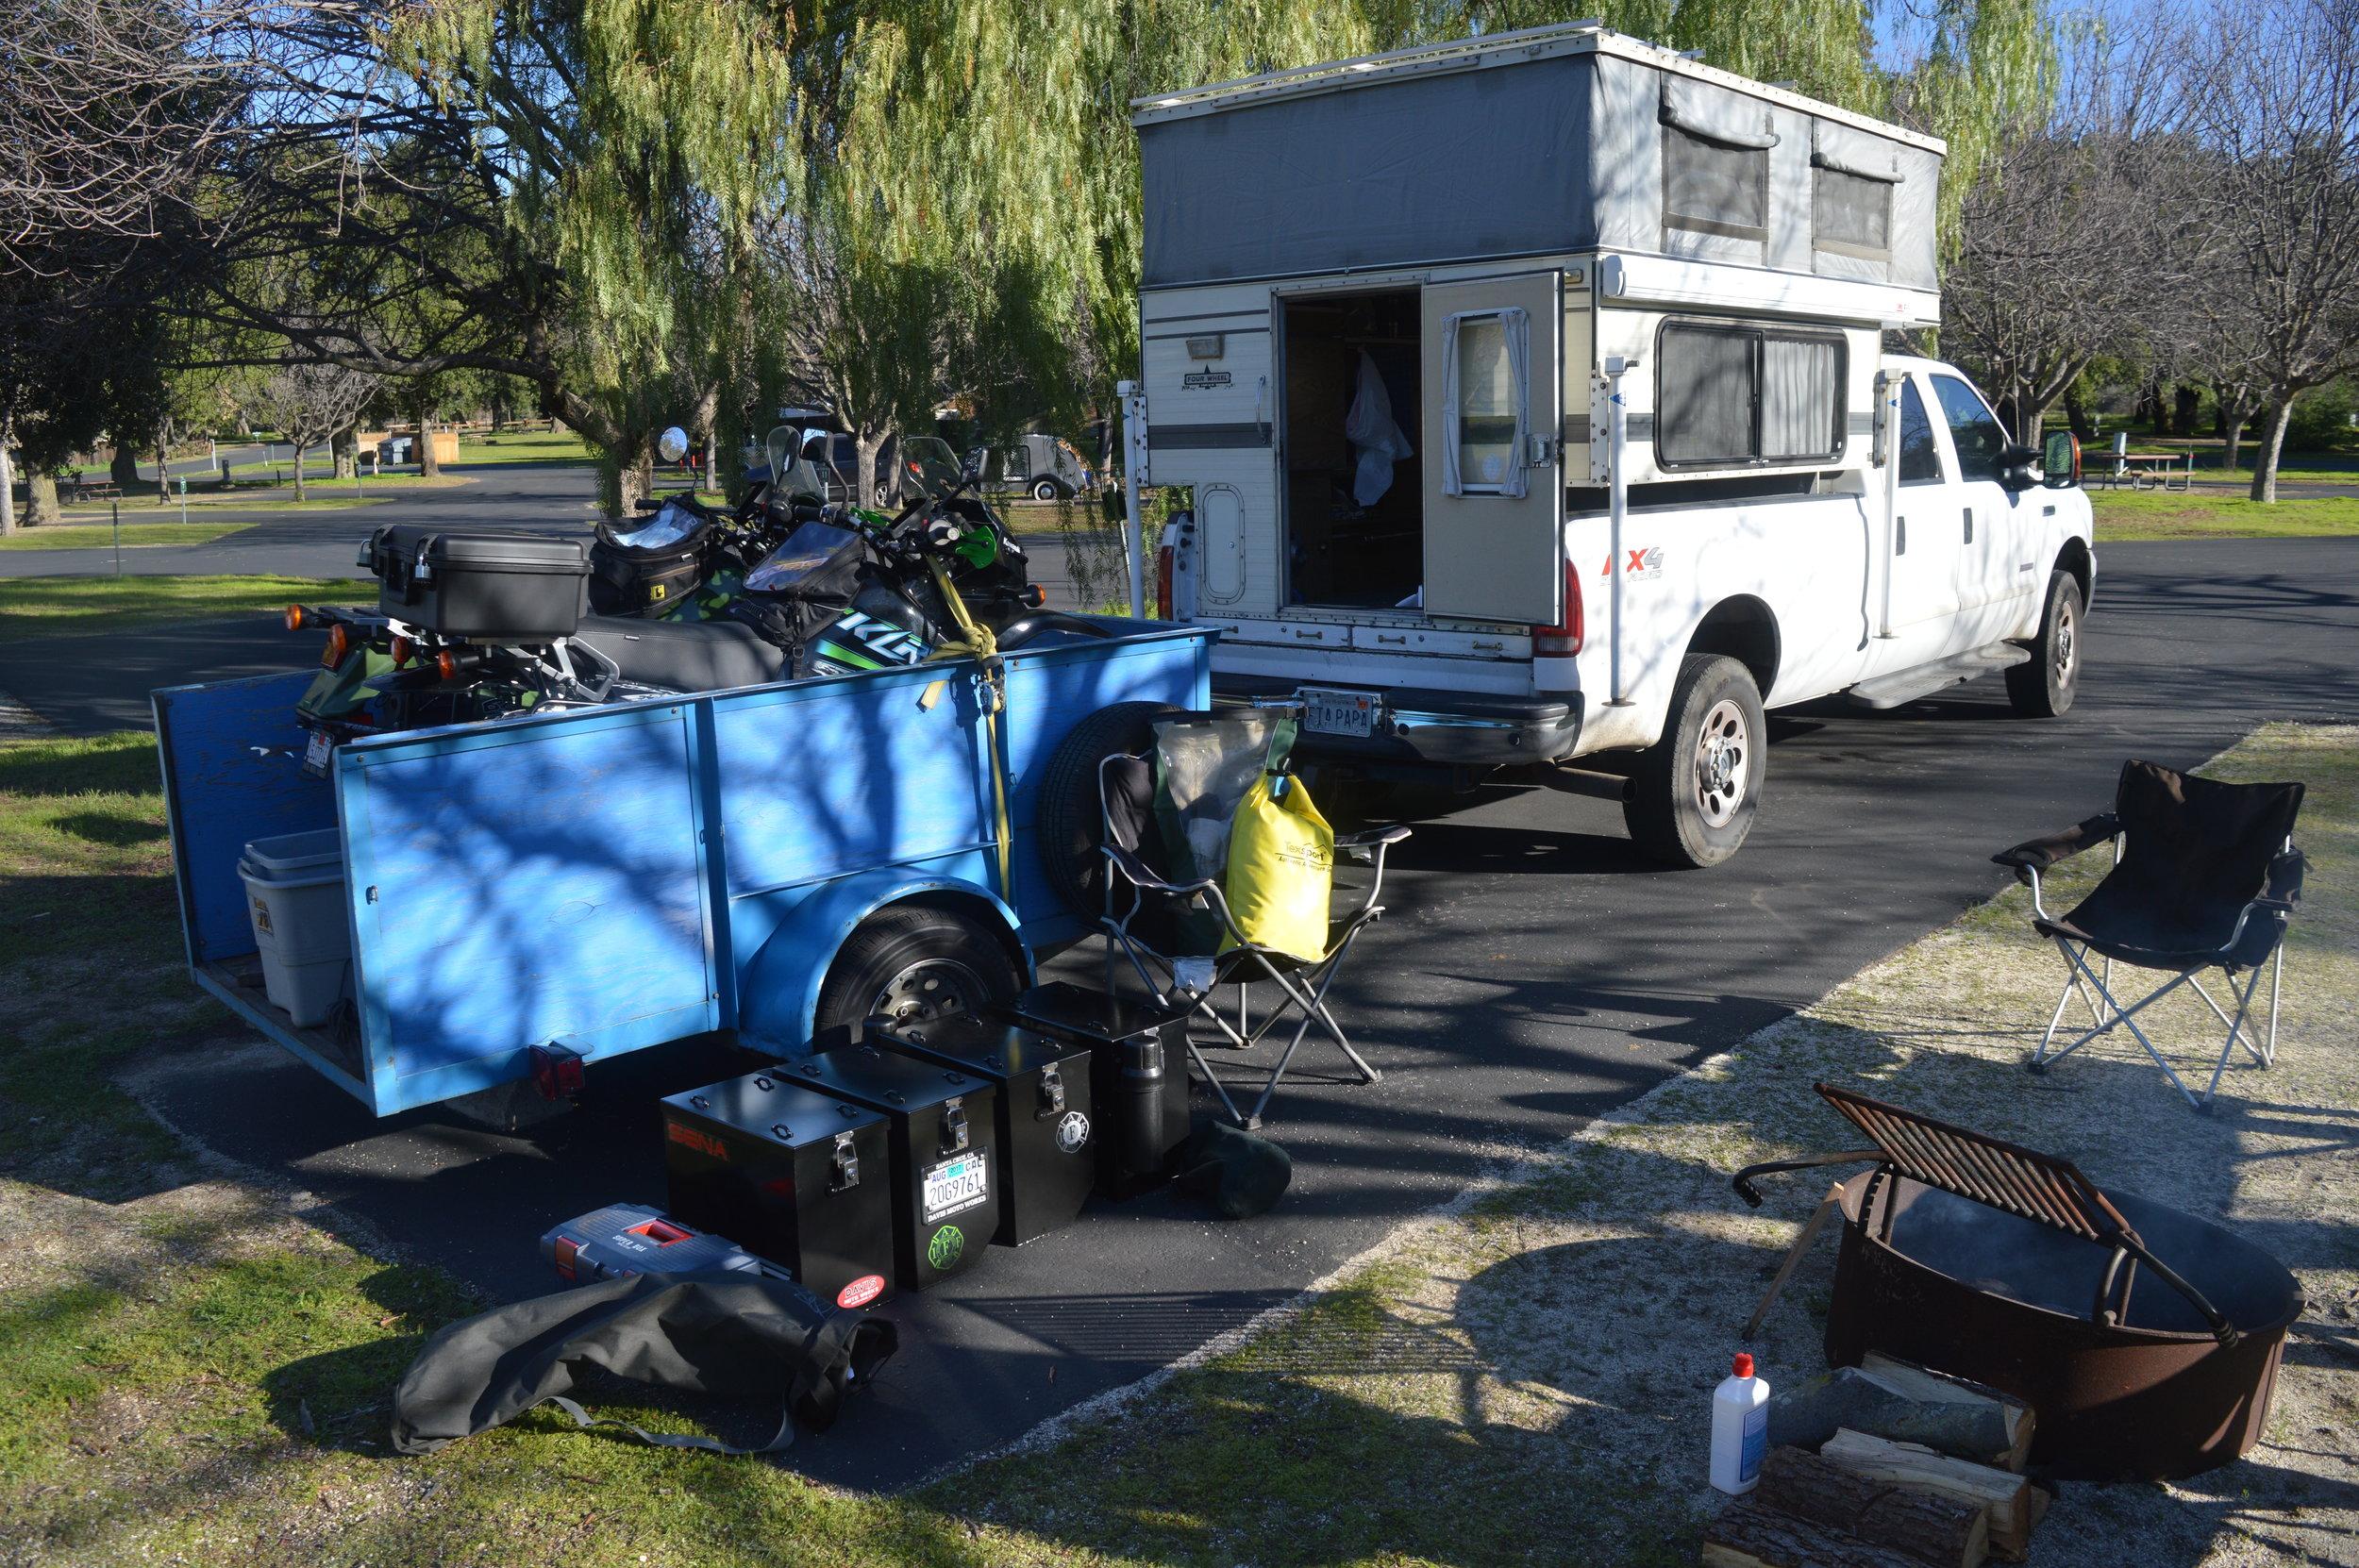 Camp at Potrero County Park (San Diego County)